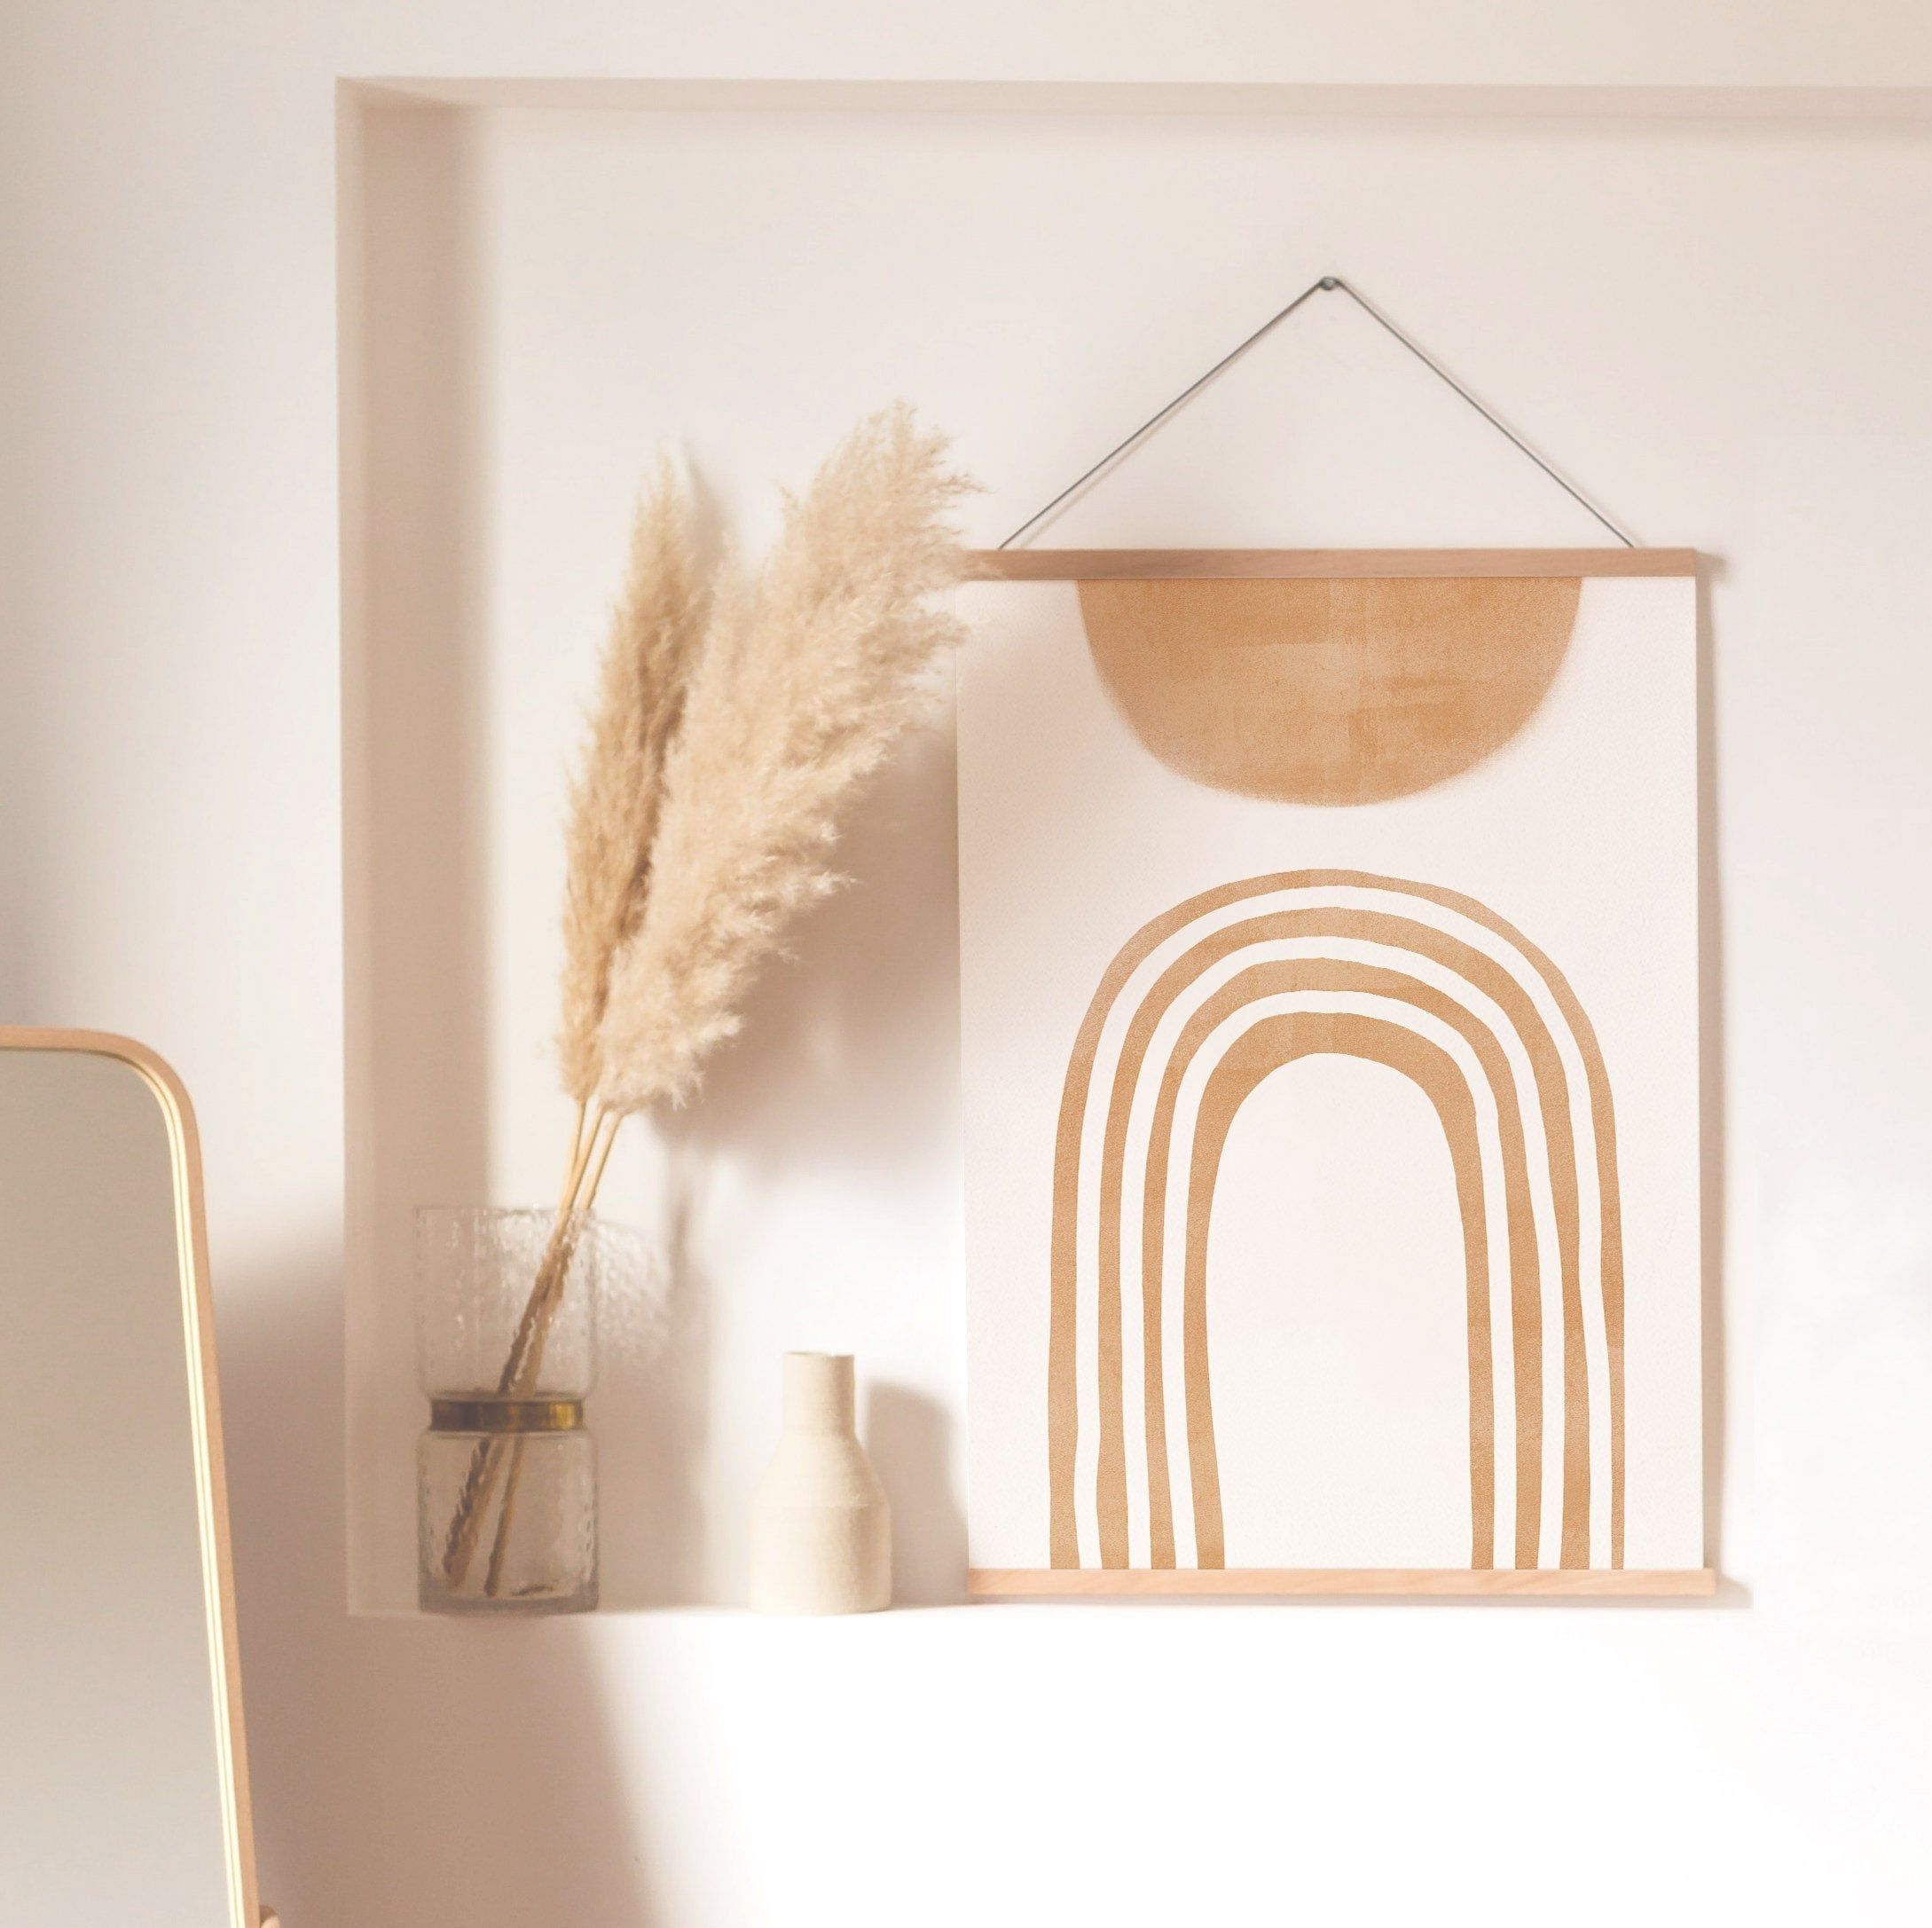 Mid Century Print Modern Arch Line Art Modern Abstract Art Etsy Wall Art Living Room Wall Decor Bedroom Wall Decor